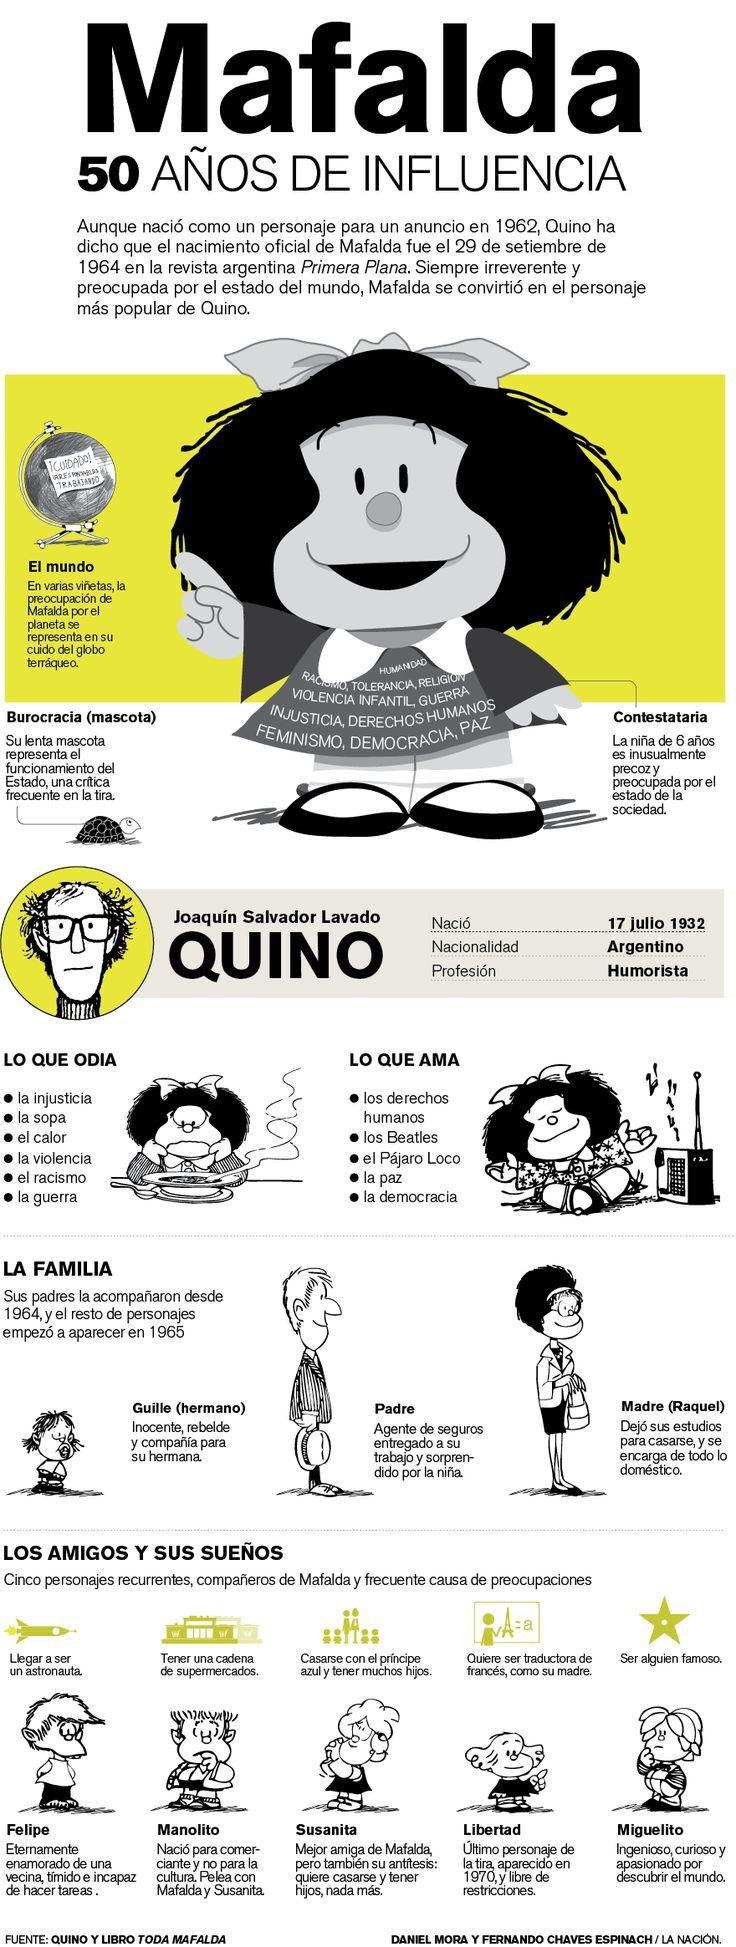 La infinita irreverencia de #Mafalda llega a los 50 años: good share with students when studying SA capitals / independence movement